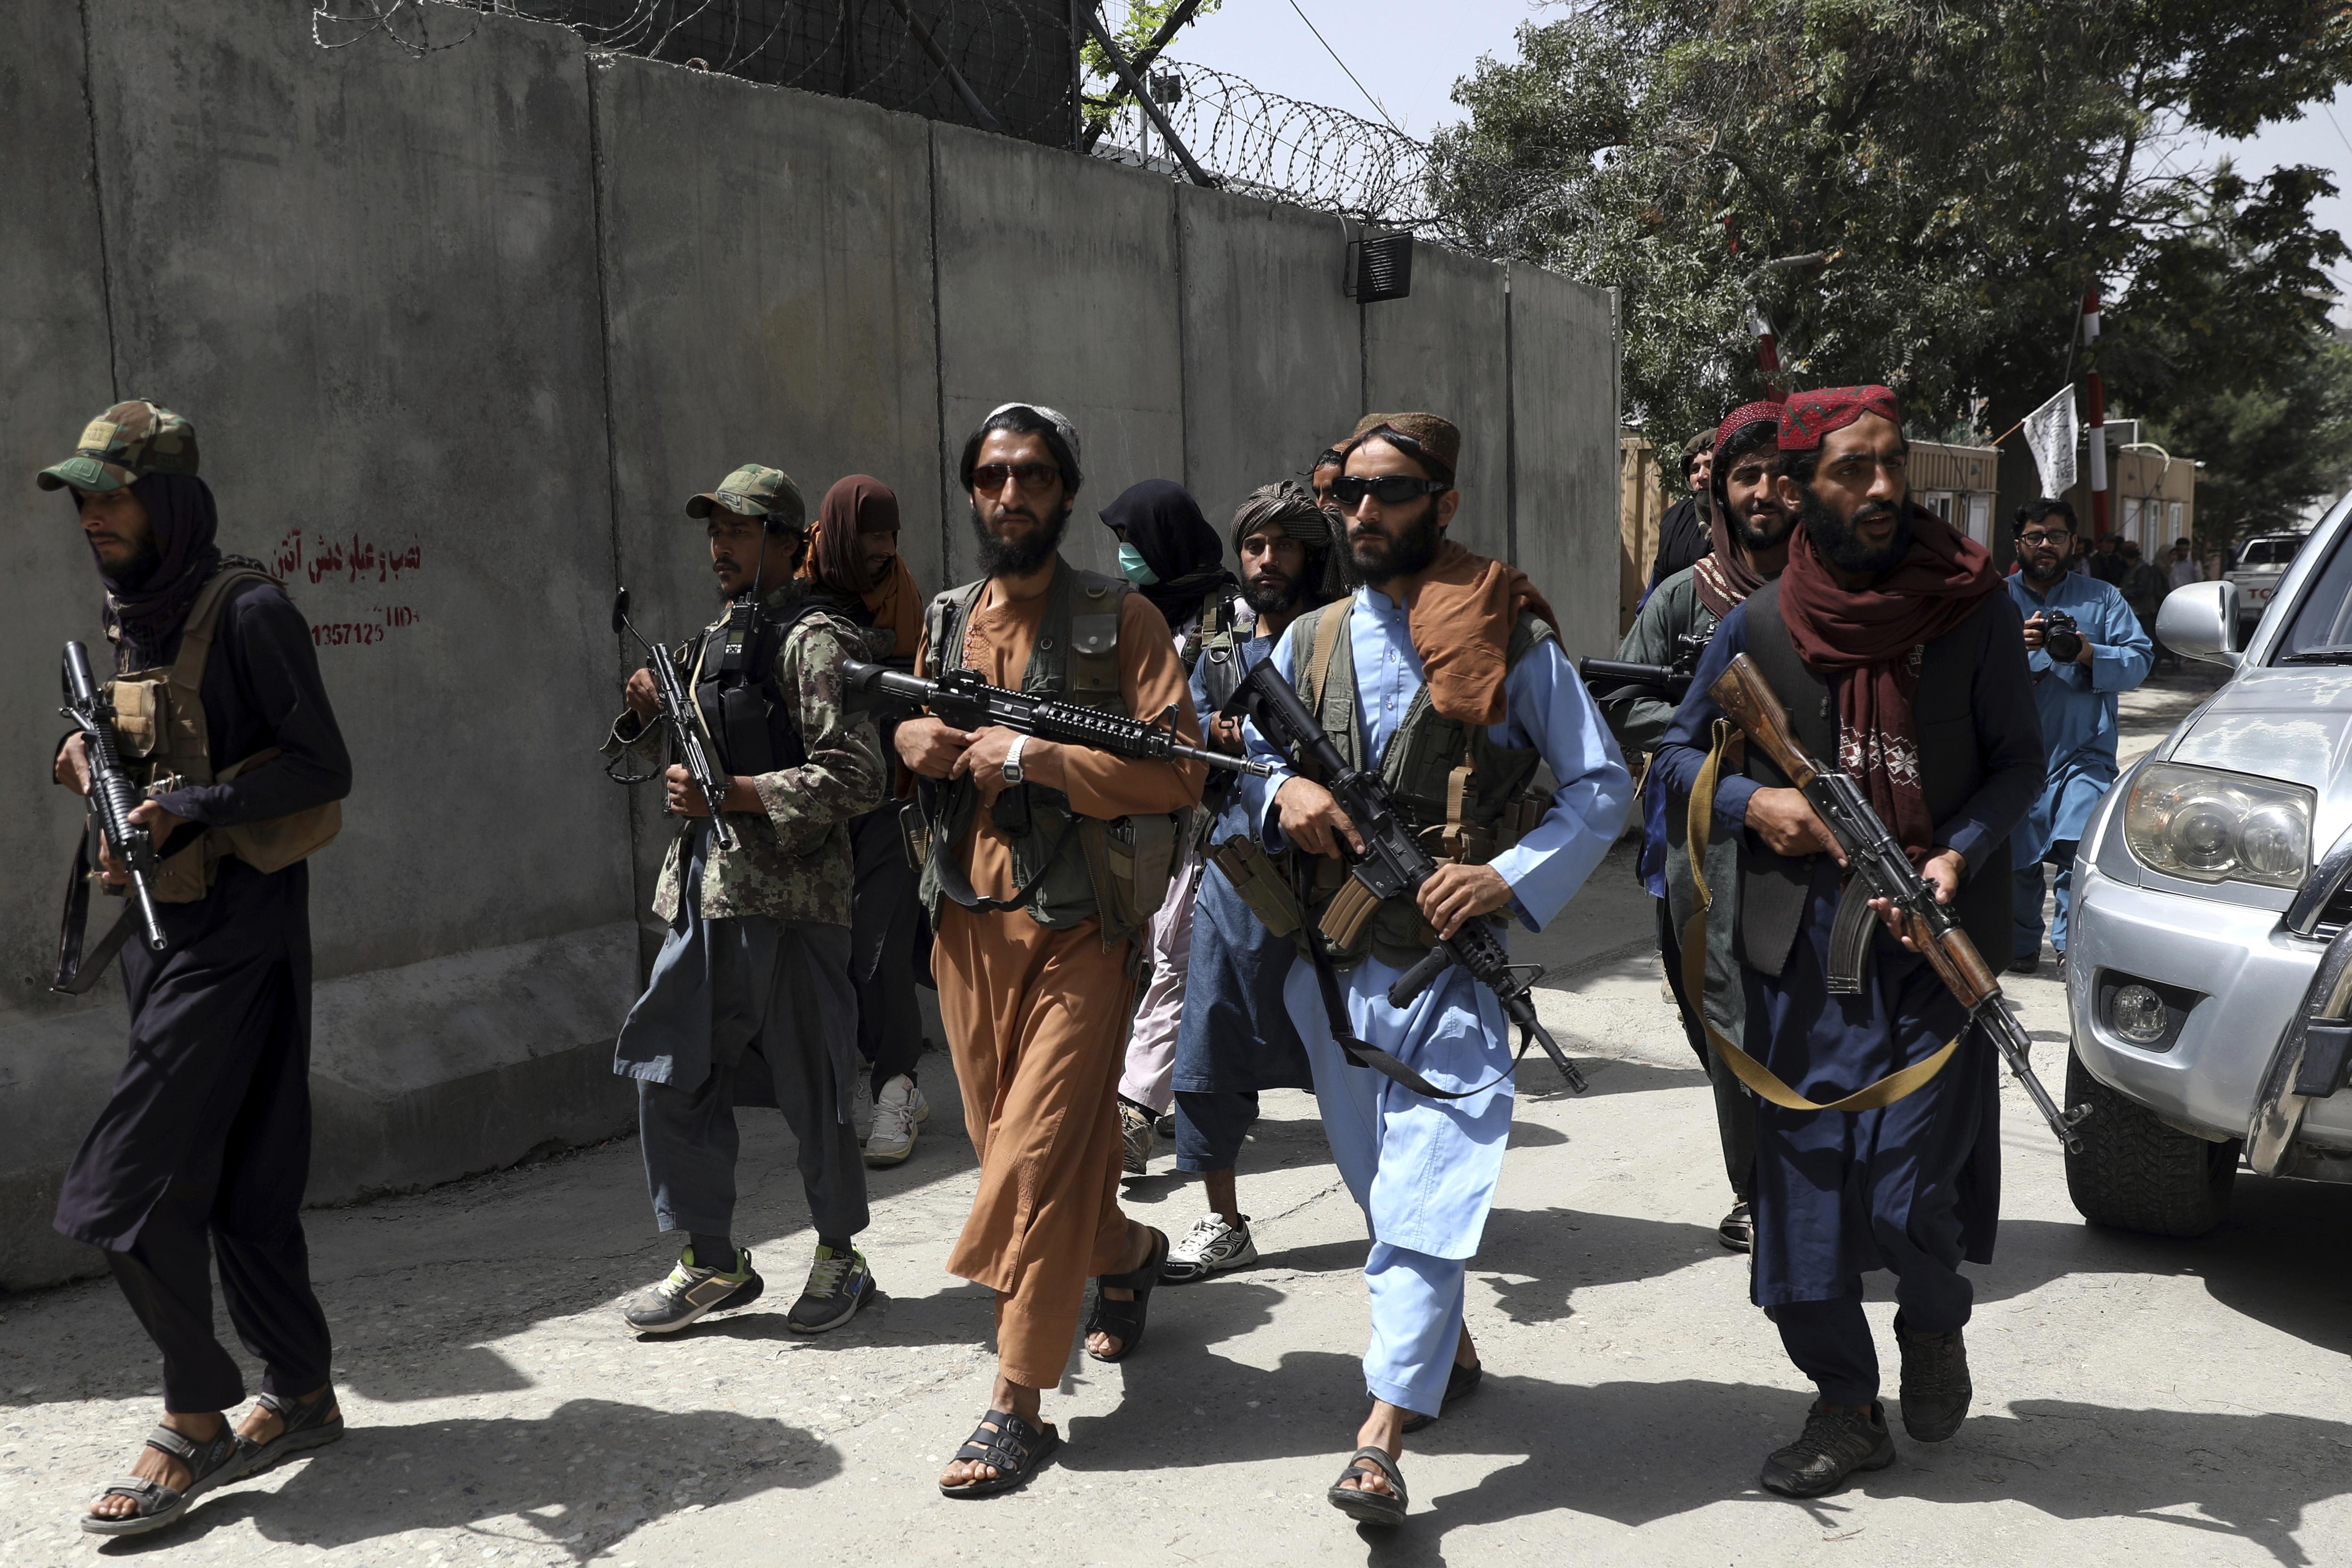 Taliban fighters patrol Wazir Akbar Khan neighborhood in Kabul.